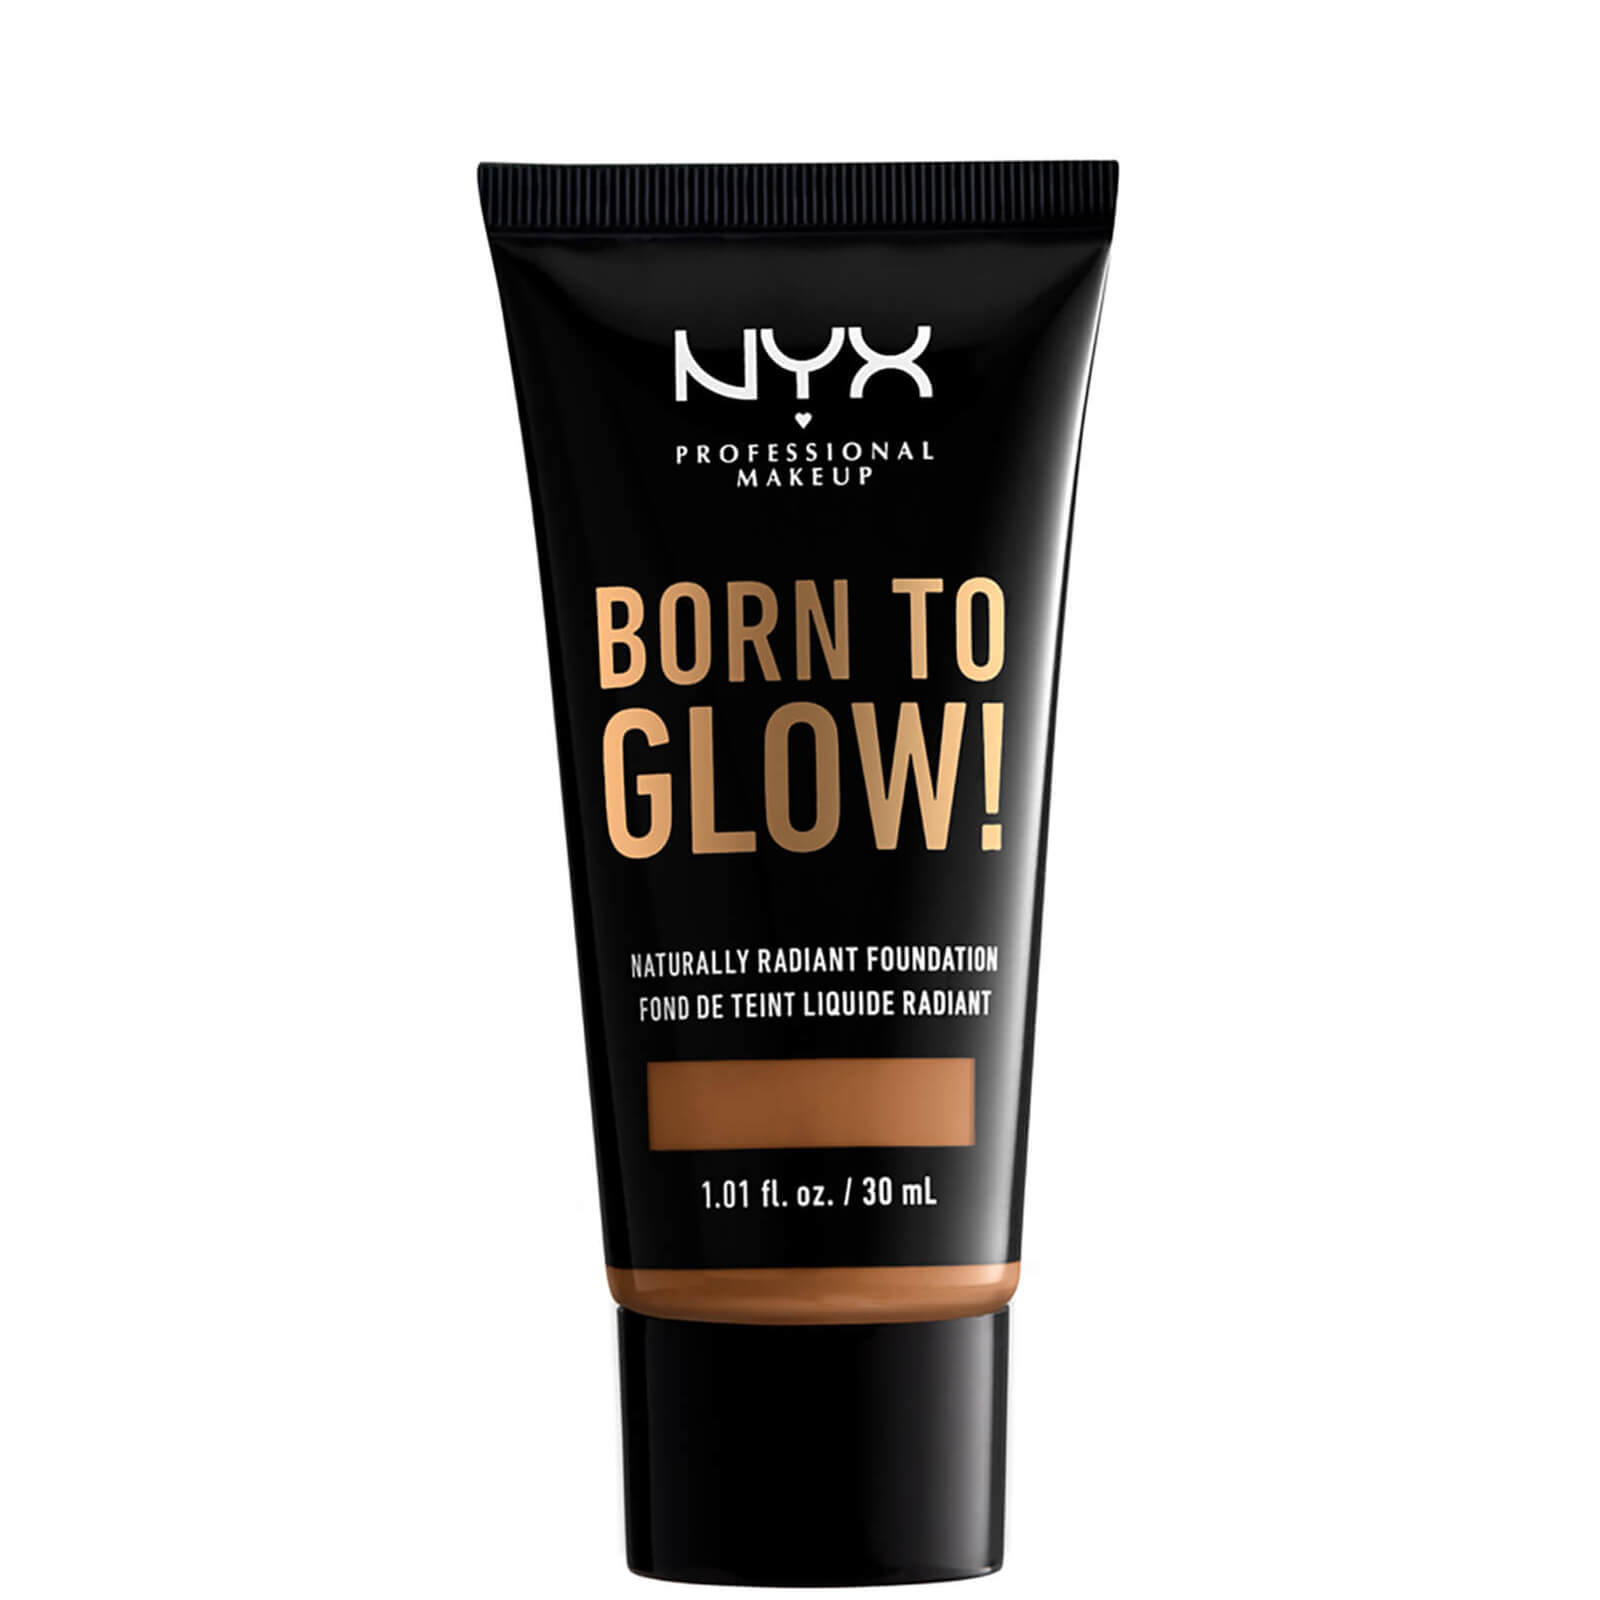 Купить NYX Professional Makeup Born to Glow Naturally Radiant Foundation 30ml (Various Shades) - Almond